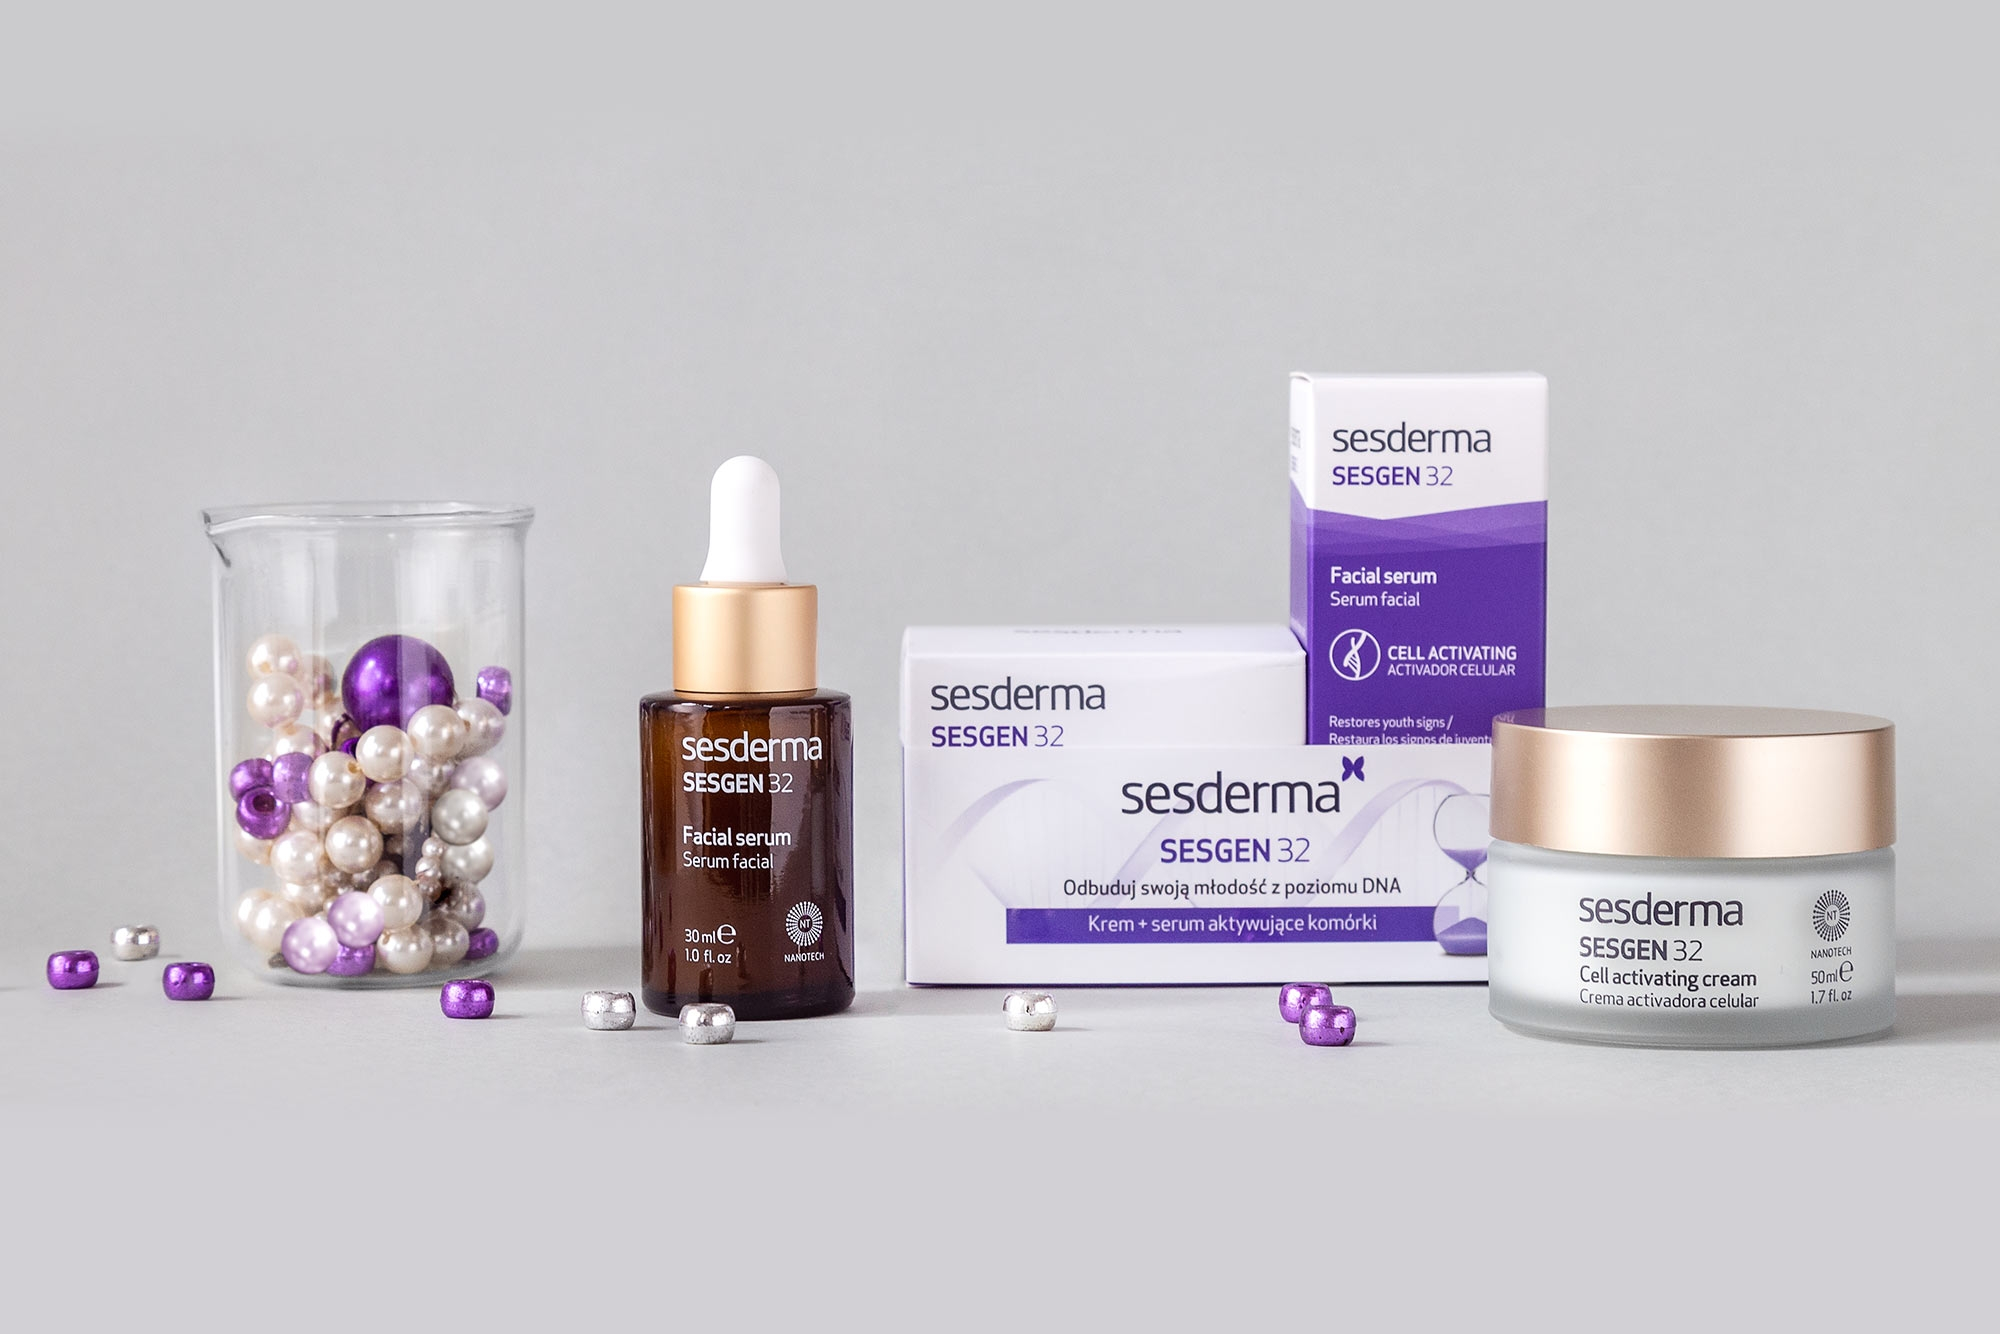 SESGEN 32 Krem + serum aktywujące komórki